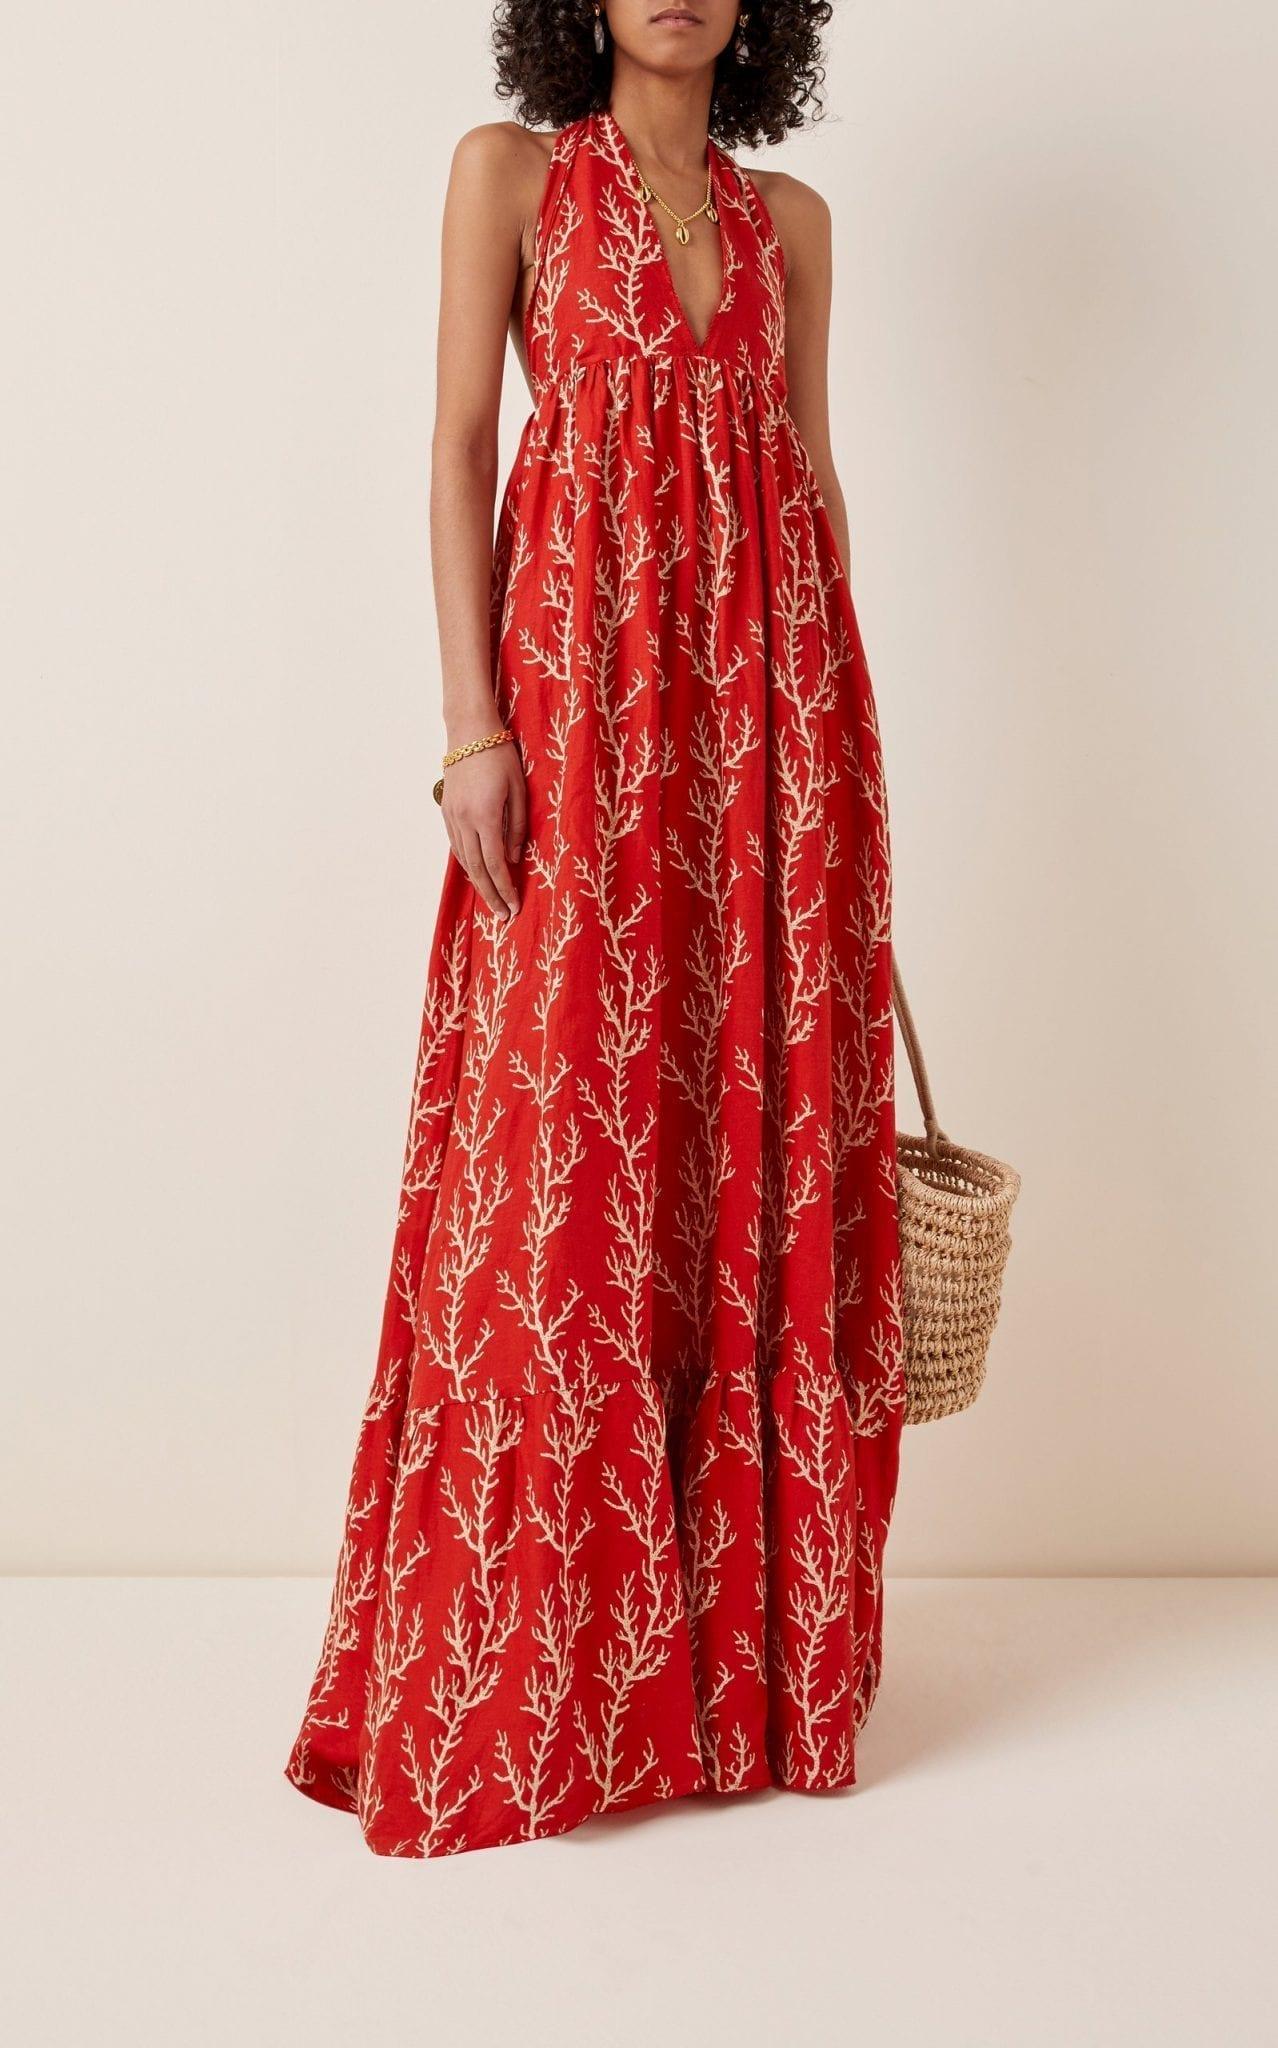 AGUA BY AGUA BENDITA Oliva Arrecife Printed Linen Halterneck Maxi Dress